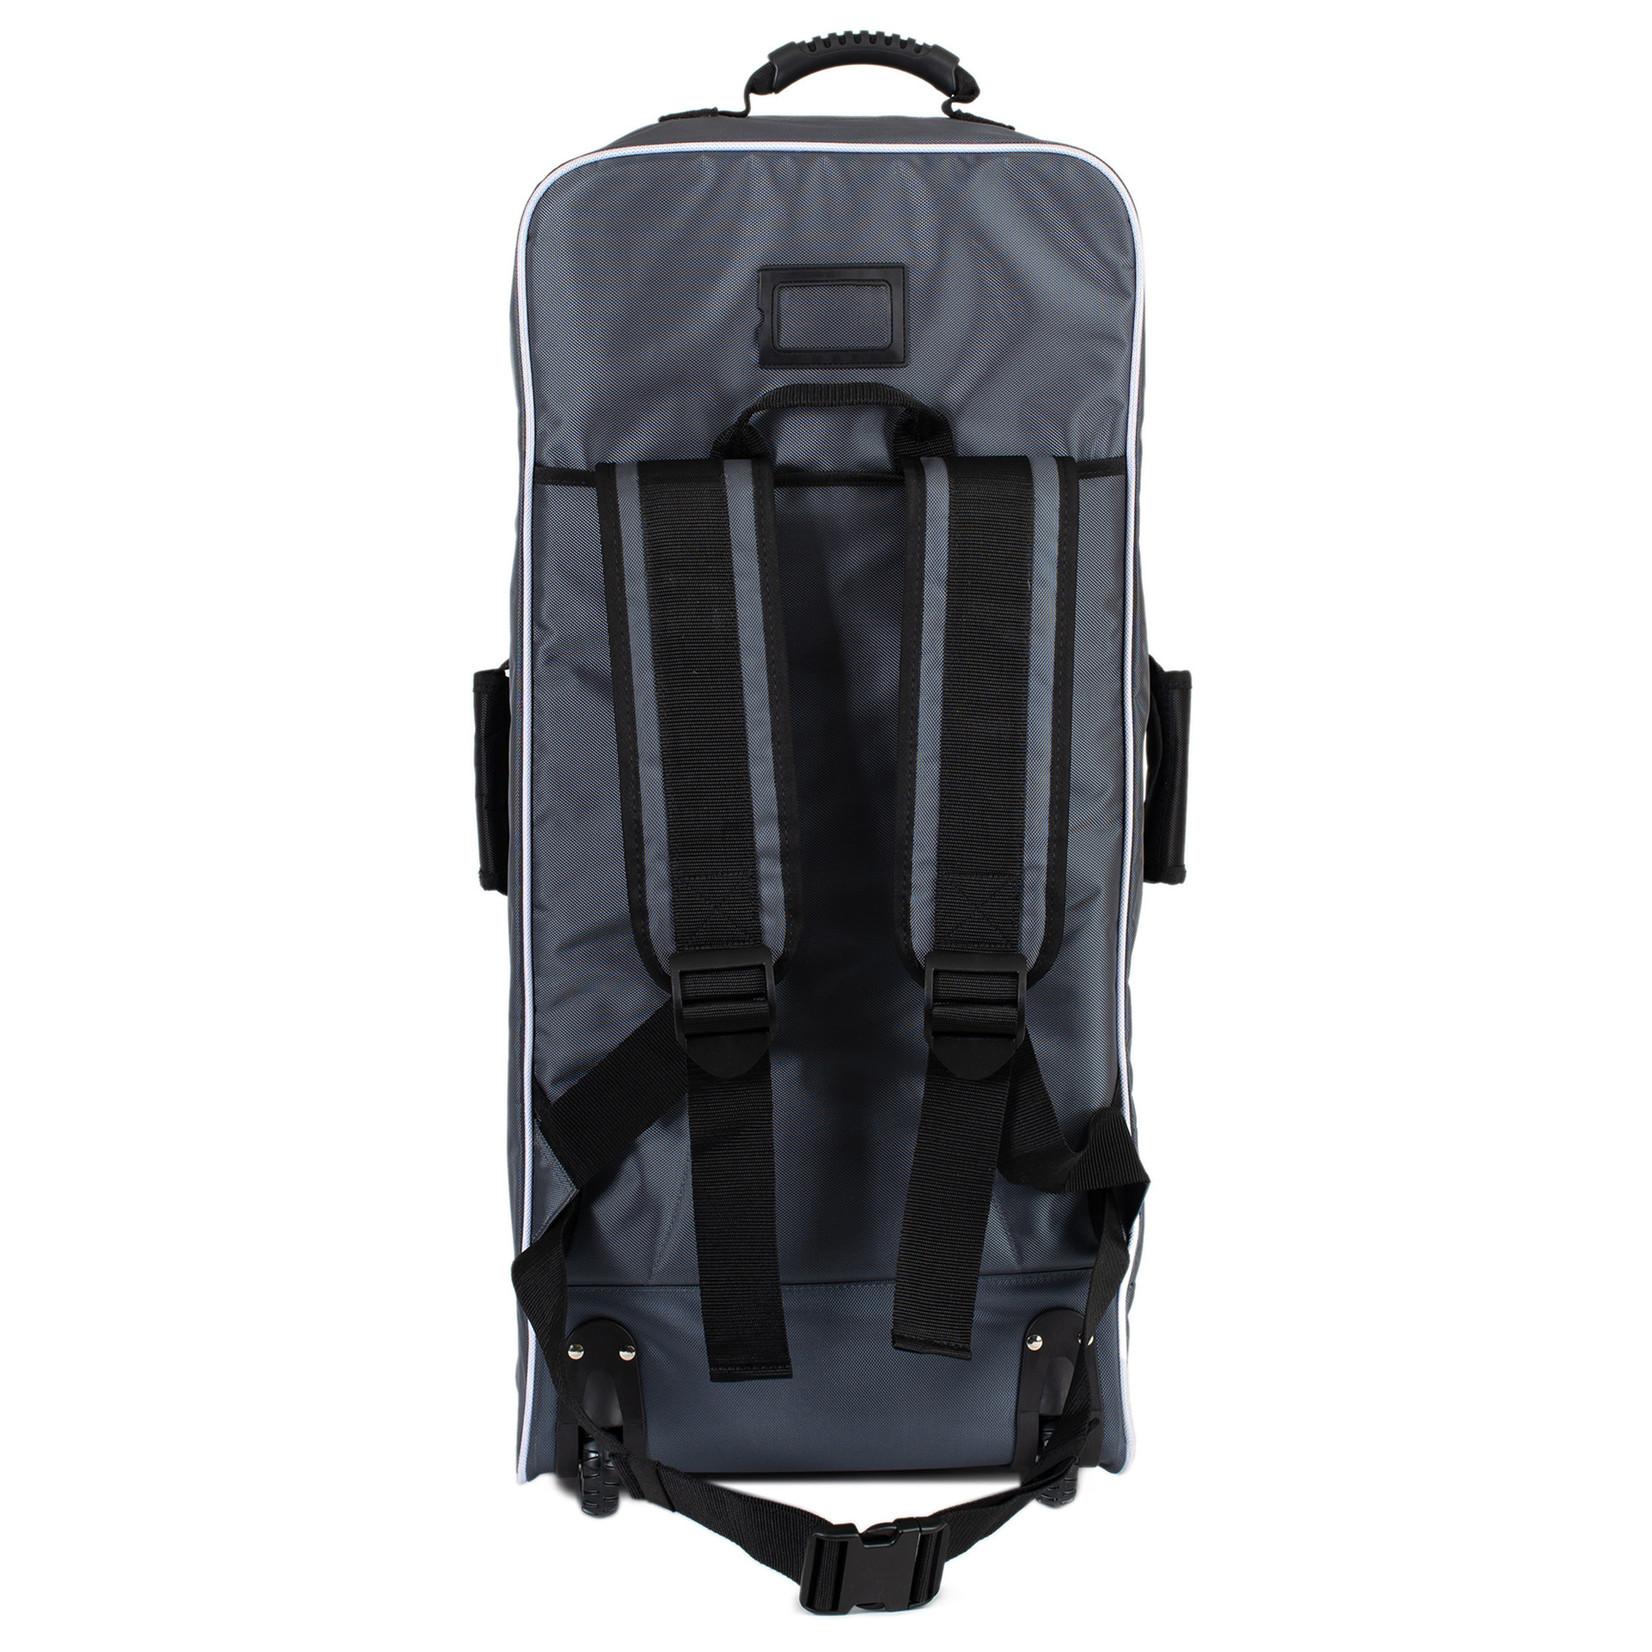 Retrospec Nomad iSUP Paddleboard Bag